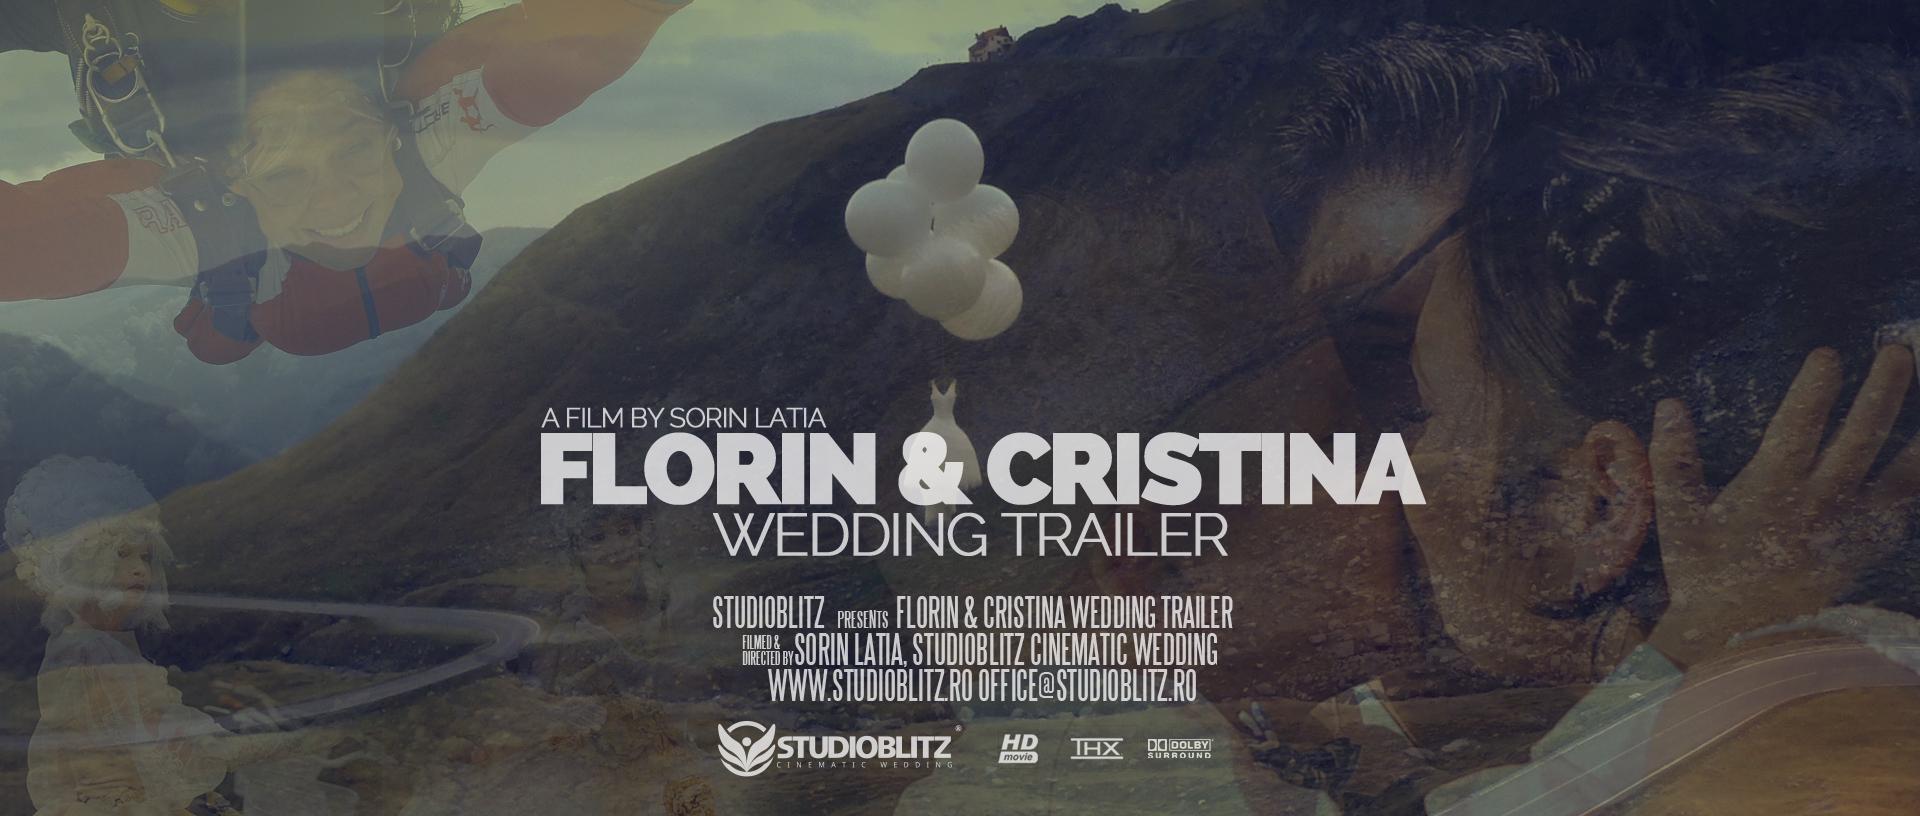 coperta-cameraman-profesionist-de-nunta-trailer-florin-si-cristina